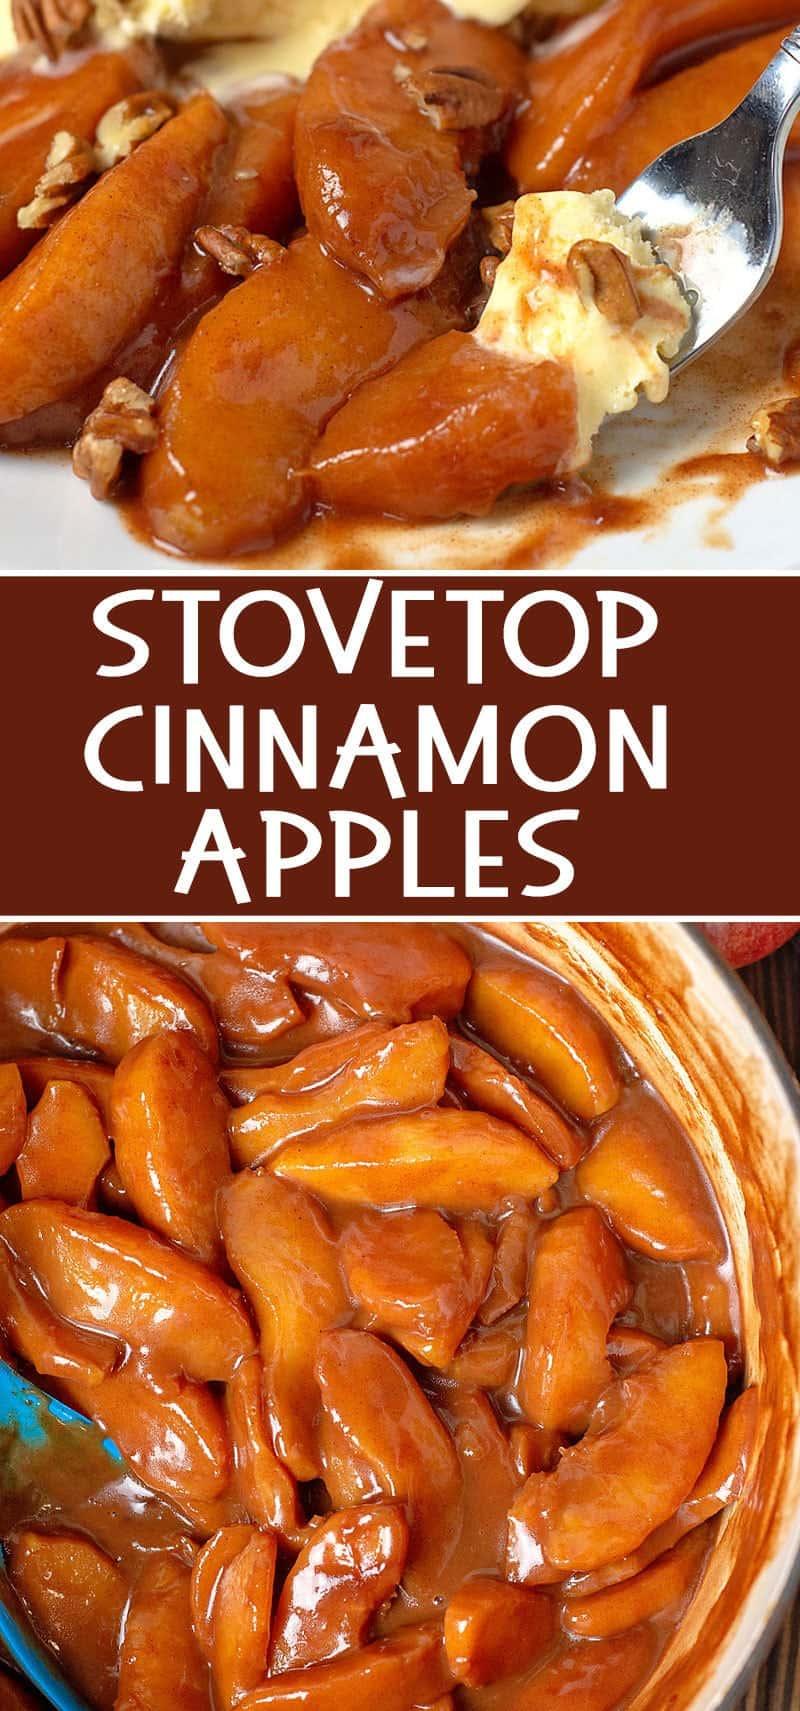 How to make cinnamon apples on the stovetop